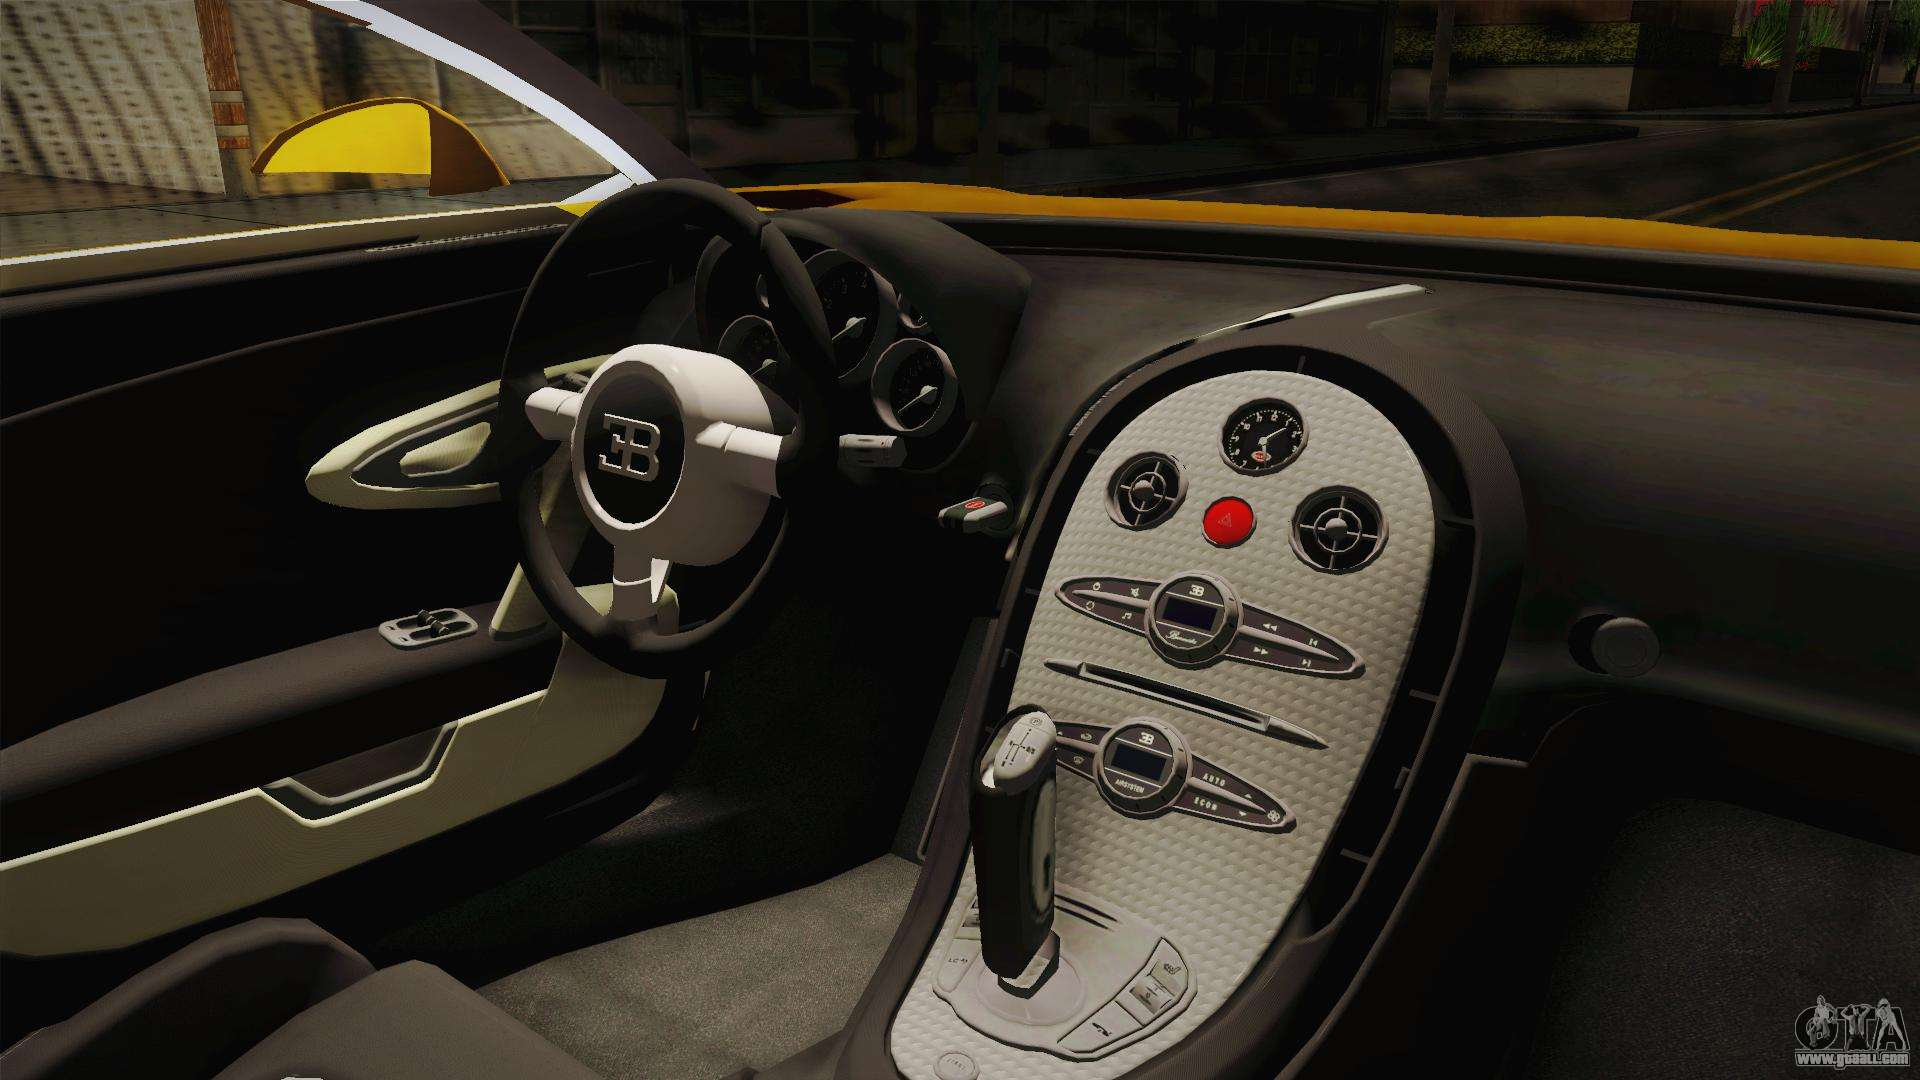 375354-gta-sa-2016-12-31-16-16-41-14 Terrific Bugatti Veyron Mod Gta Sa Cars Trend